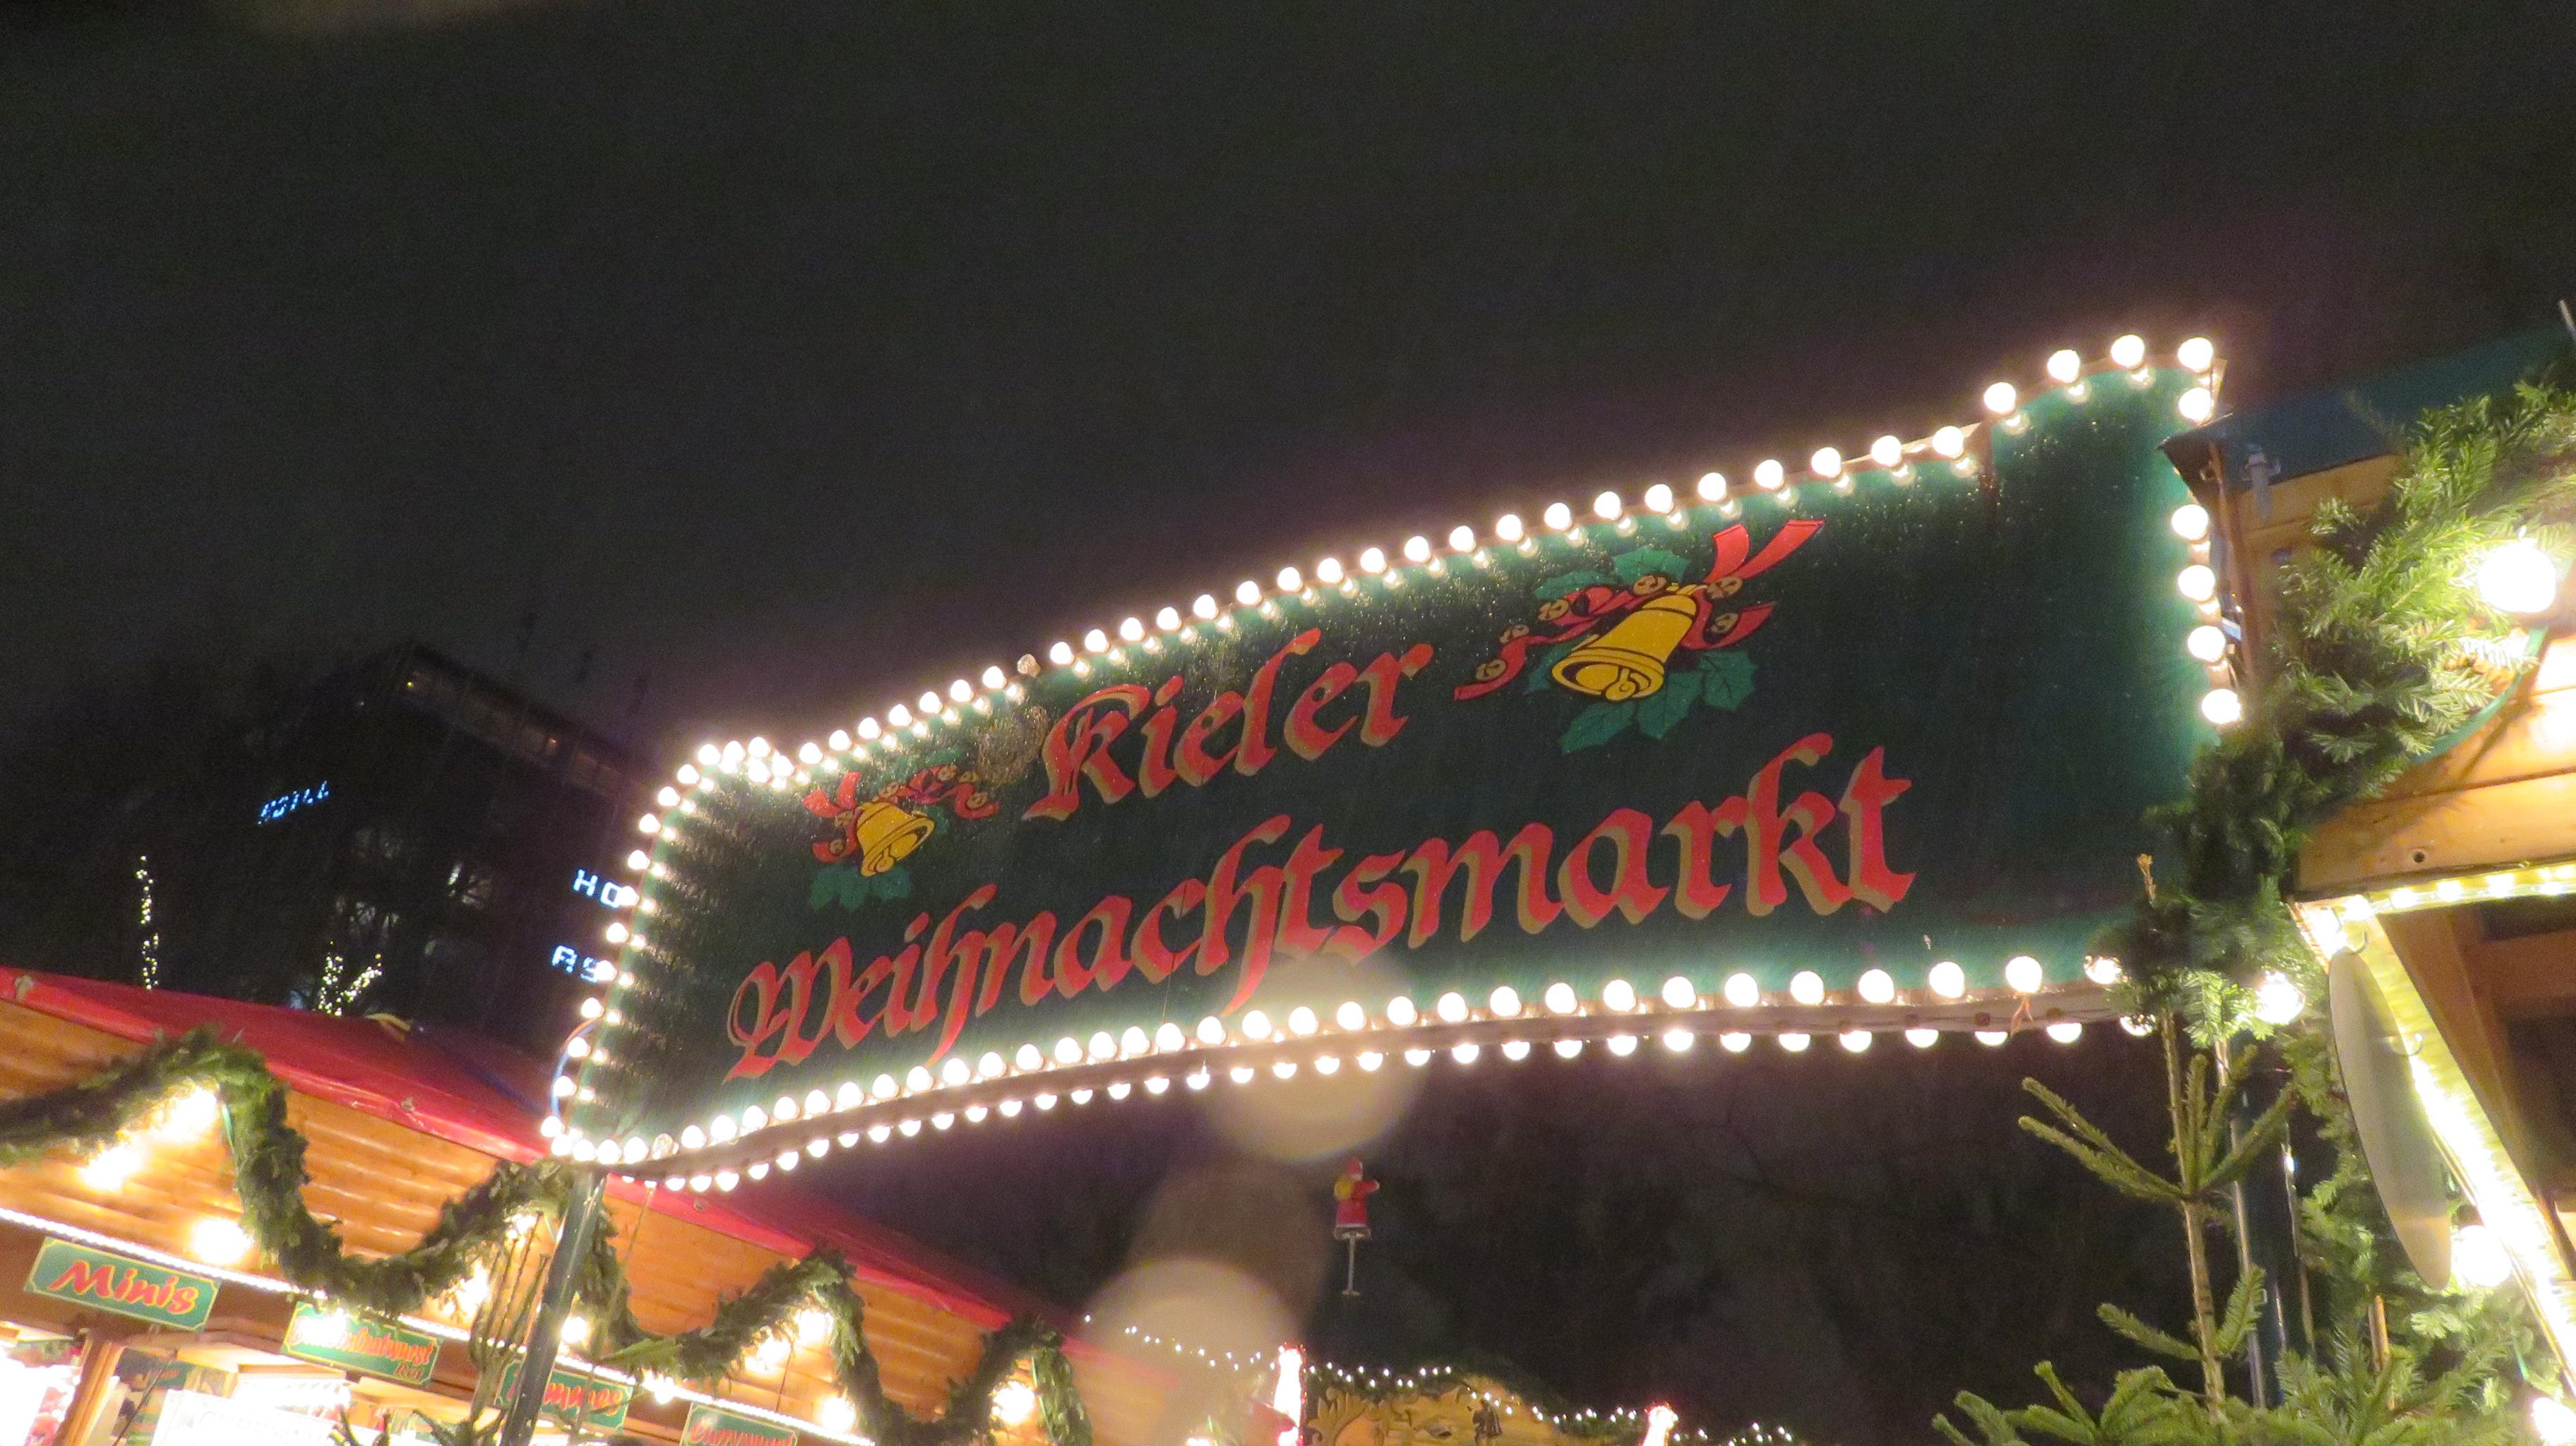 Kieler Weihnachtsmarkt, marché de Noël en Allemagne